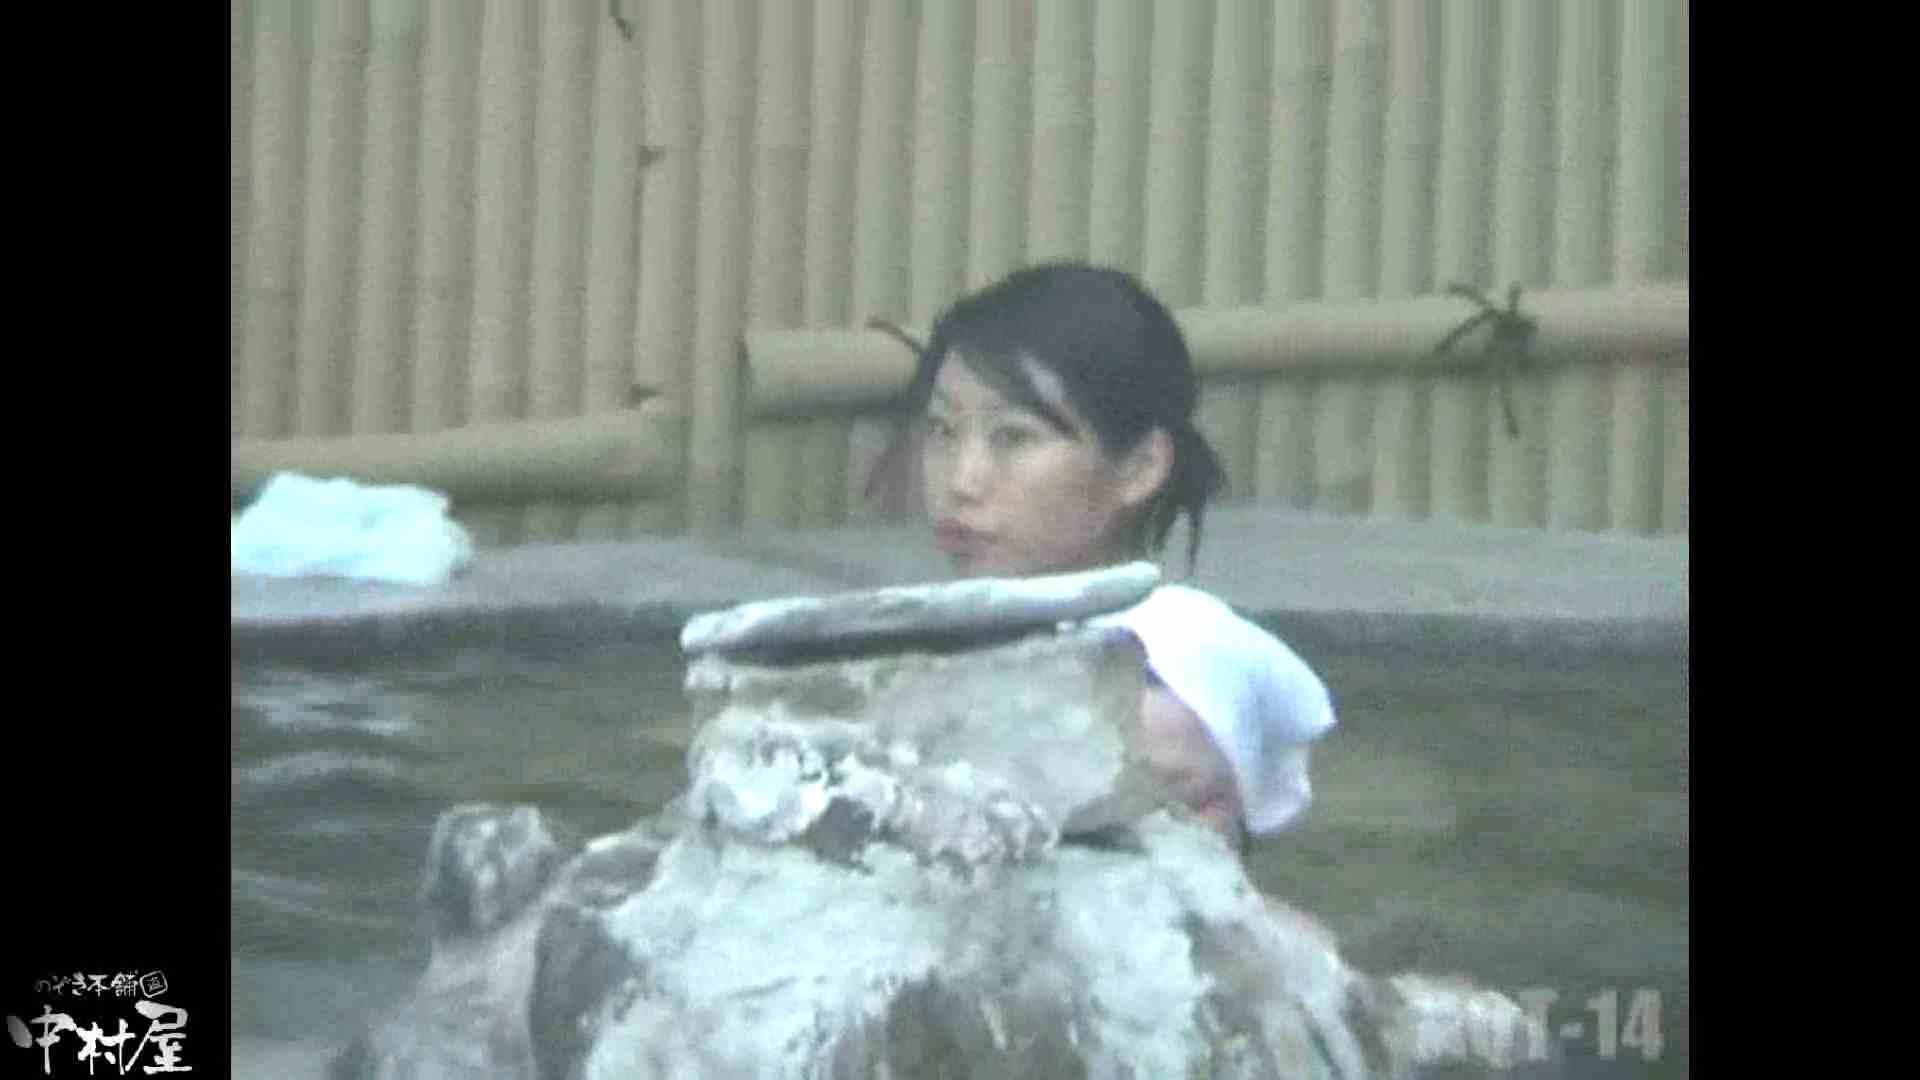 Aquaな露天風呂Vol.878潜入盗撮露天風呂十四判湯 其の一 潜入画像   露天  59画像 23